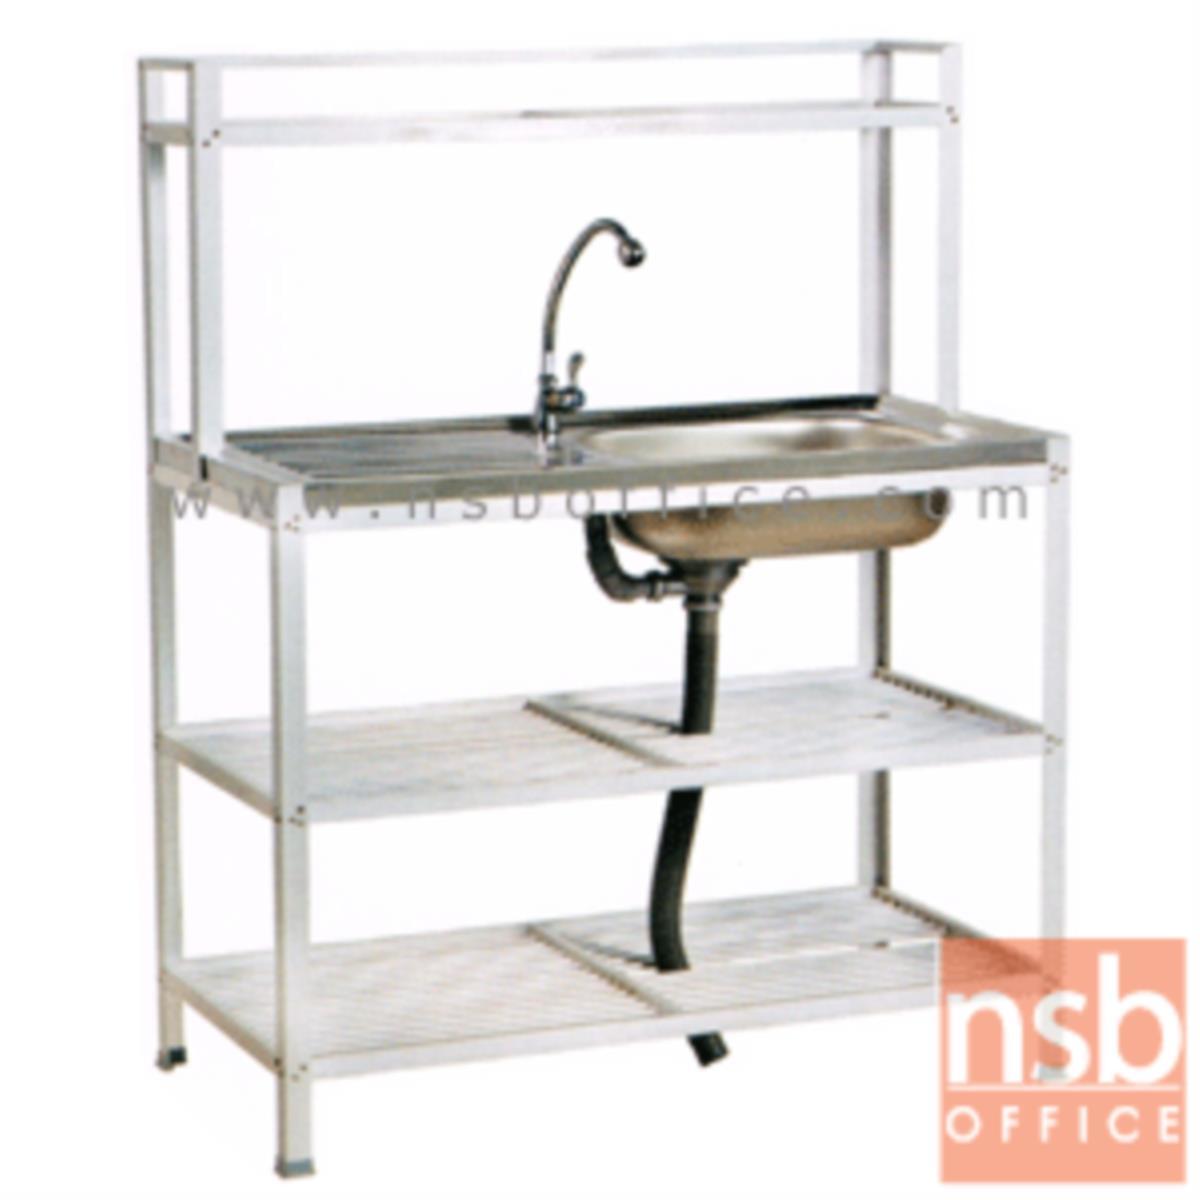 G12A037:ซิ้งค์ล้างจาน บ่อเดี่ยว เพิ่มต่อบน สเตนเลส รุ่น SN-WBC955-2 มีที่คว่ำจาน พร้อมก๊อกน้ำ